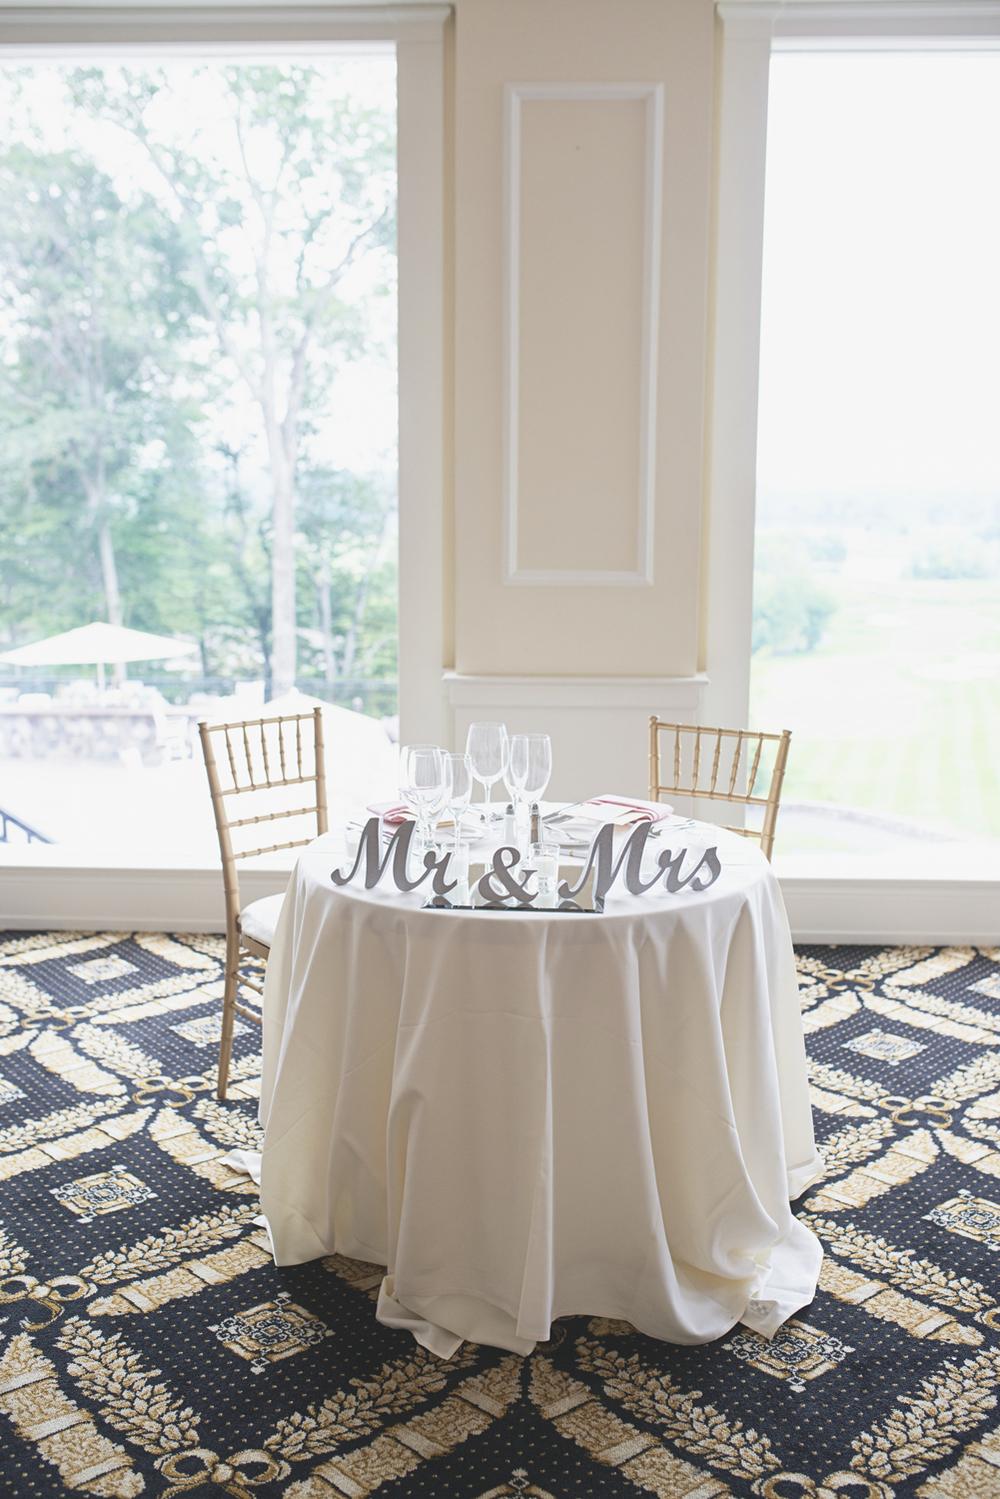 Trump National Golf Club Wedding | Washington, DC Wedding | Wedding reception | Sweetheart table